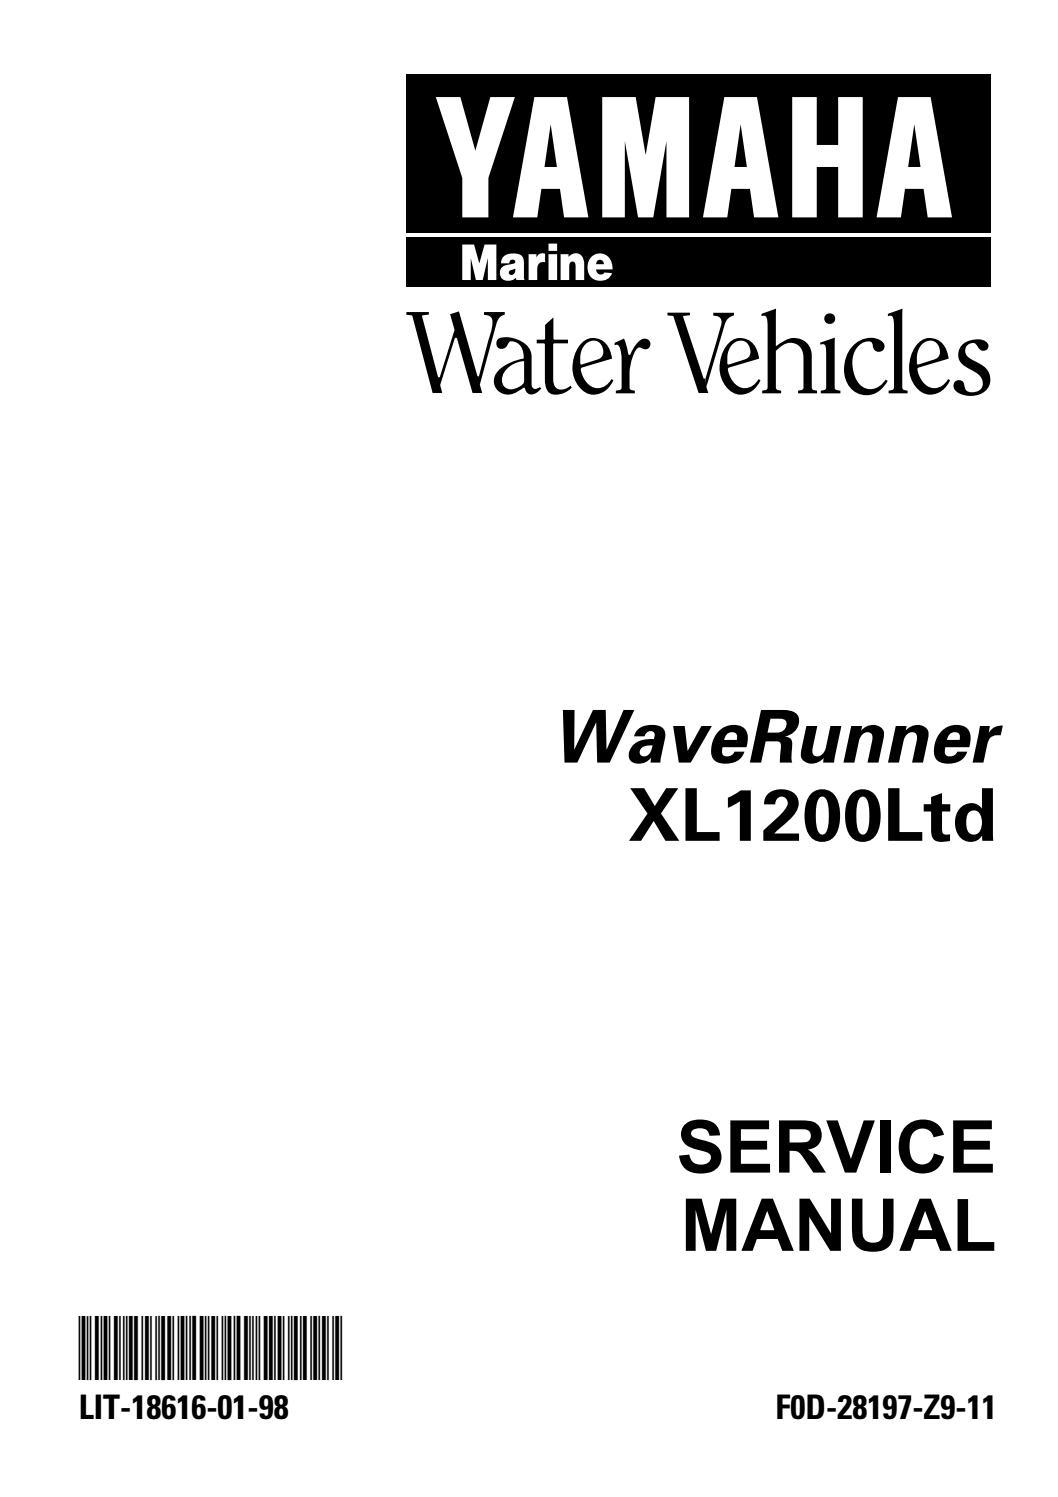 yamaha xl1200 ltd waverunner shop manual 1999-2001 by